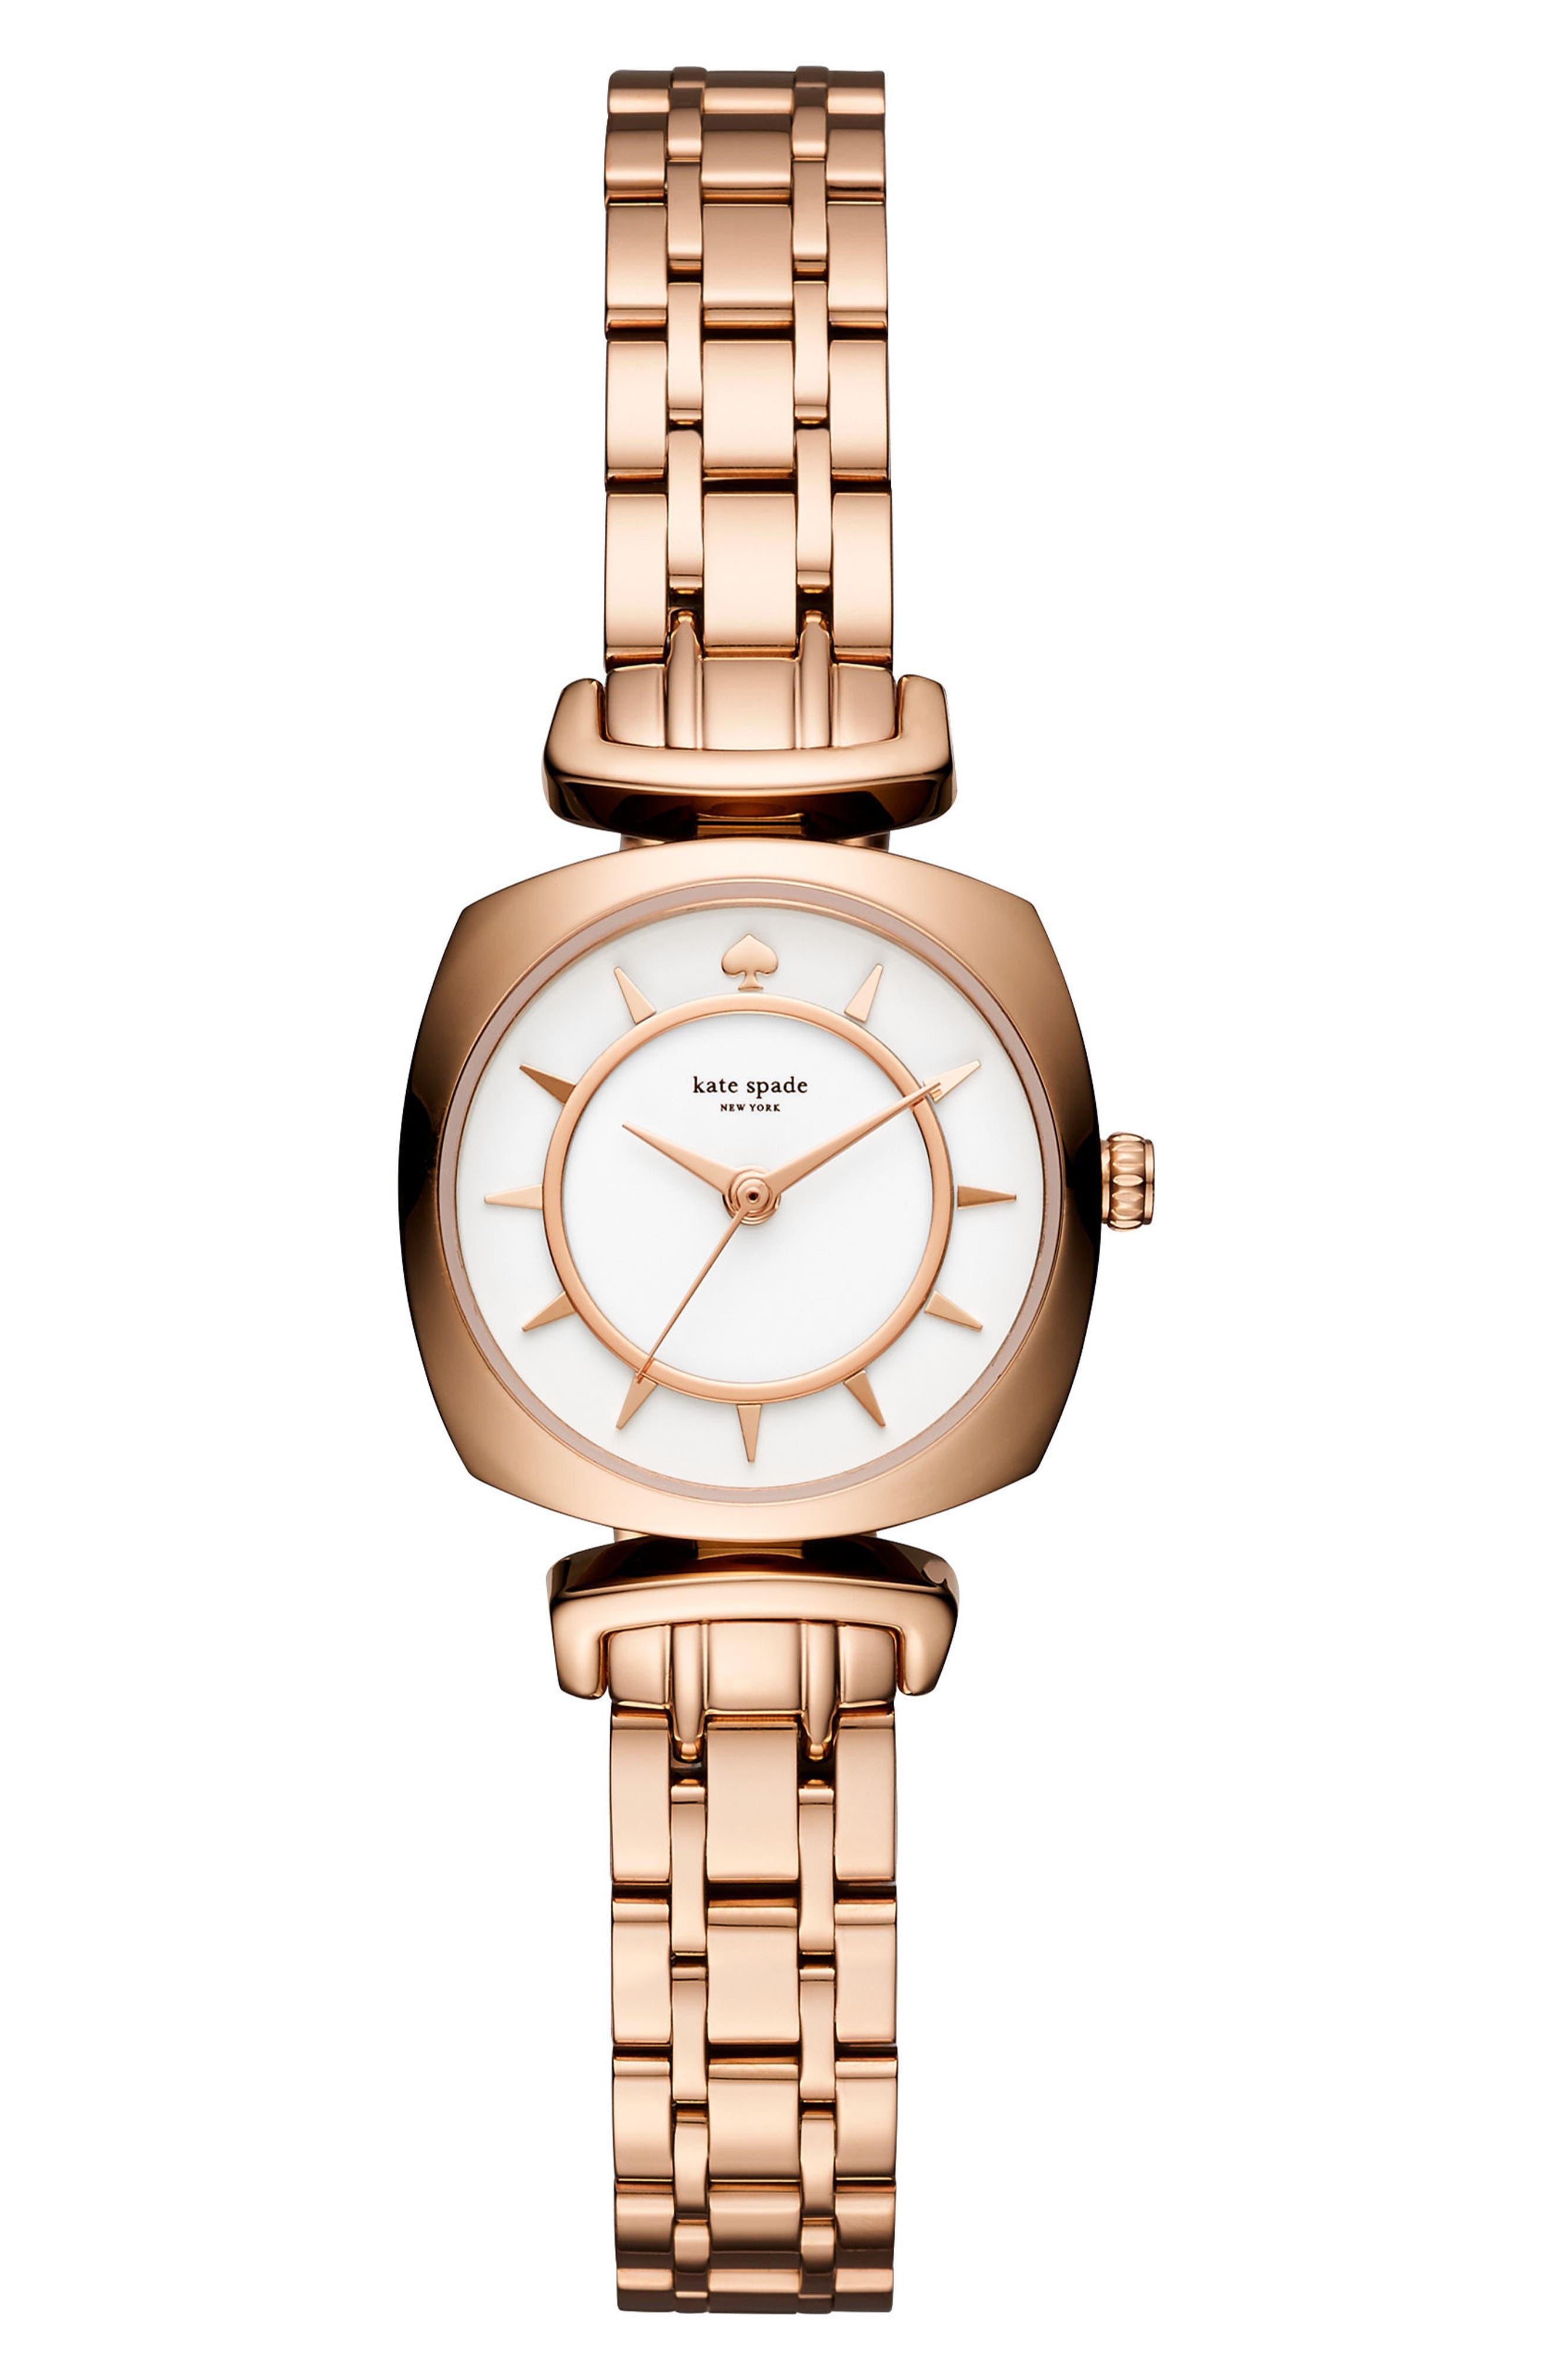 kate spade new york barrow leather strap watch, 24mm